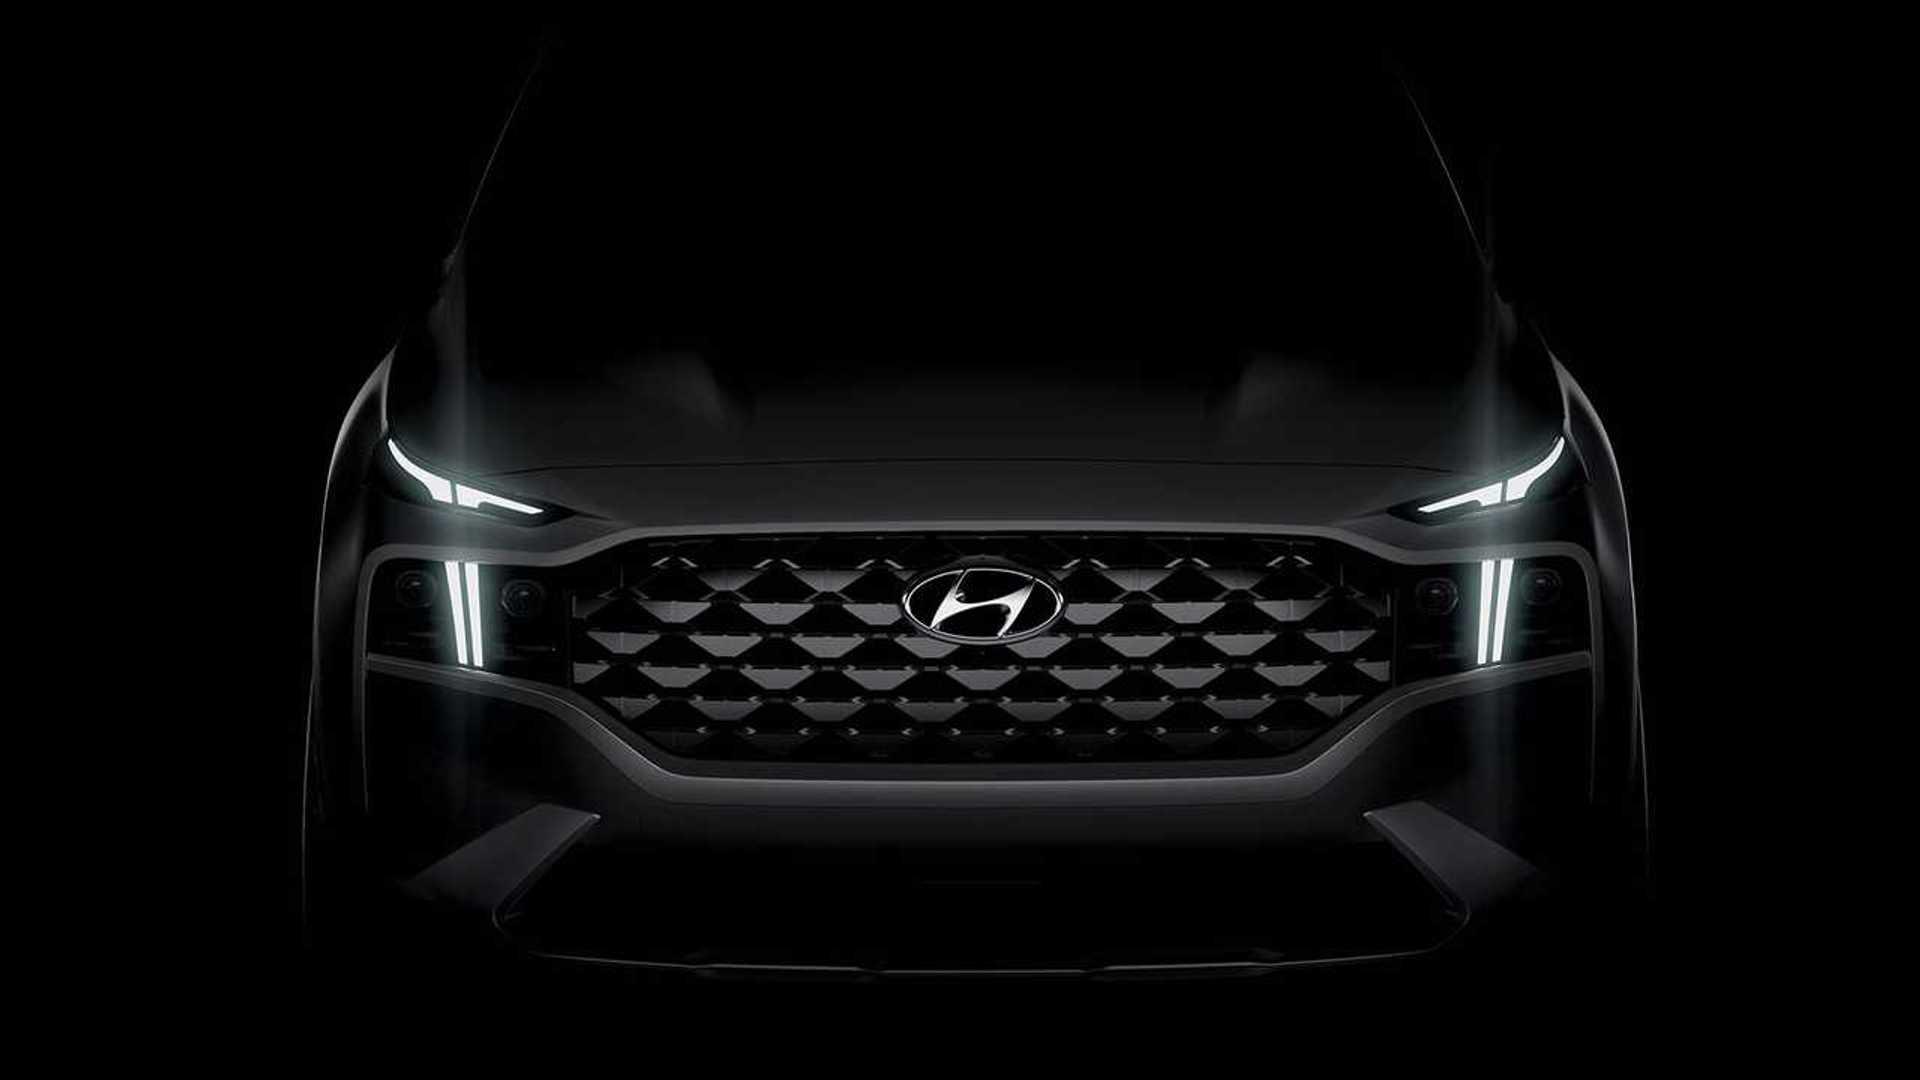 Hyundai Santa Fe 2020: teaser muy suculento